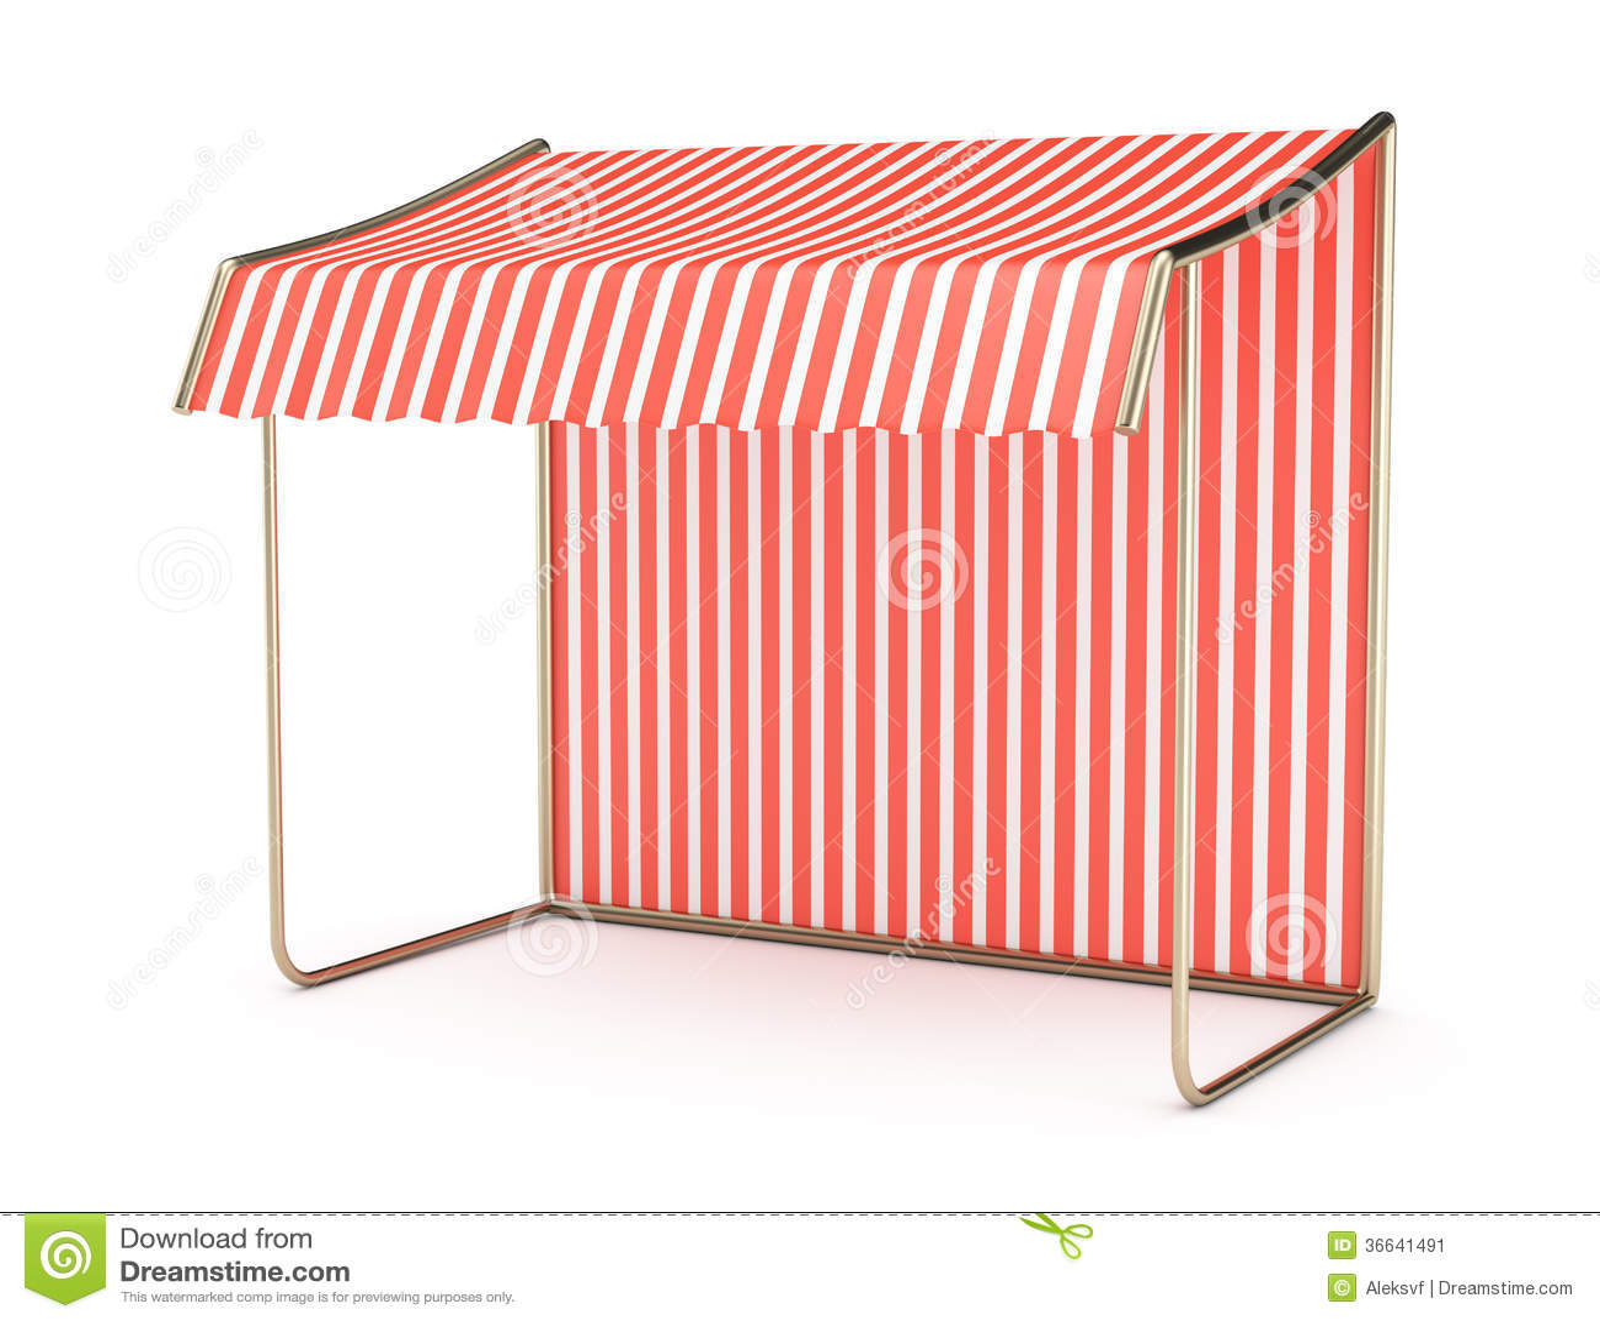 Striped Awning Stock Image Image 36641491